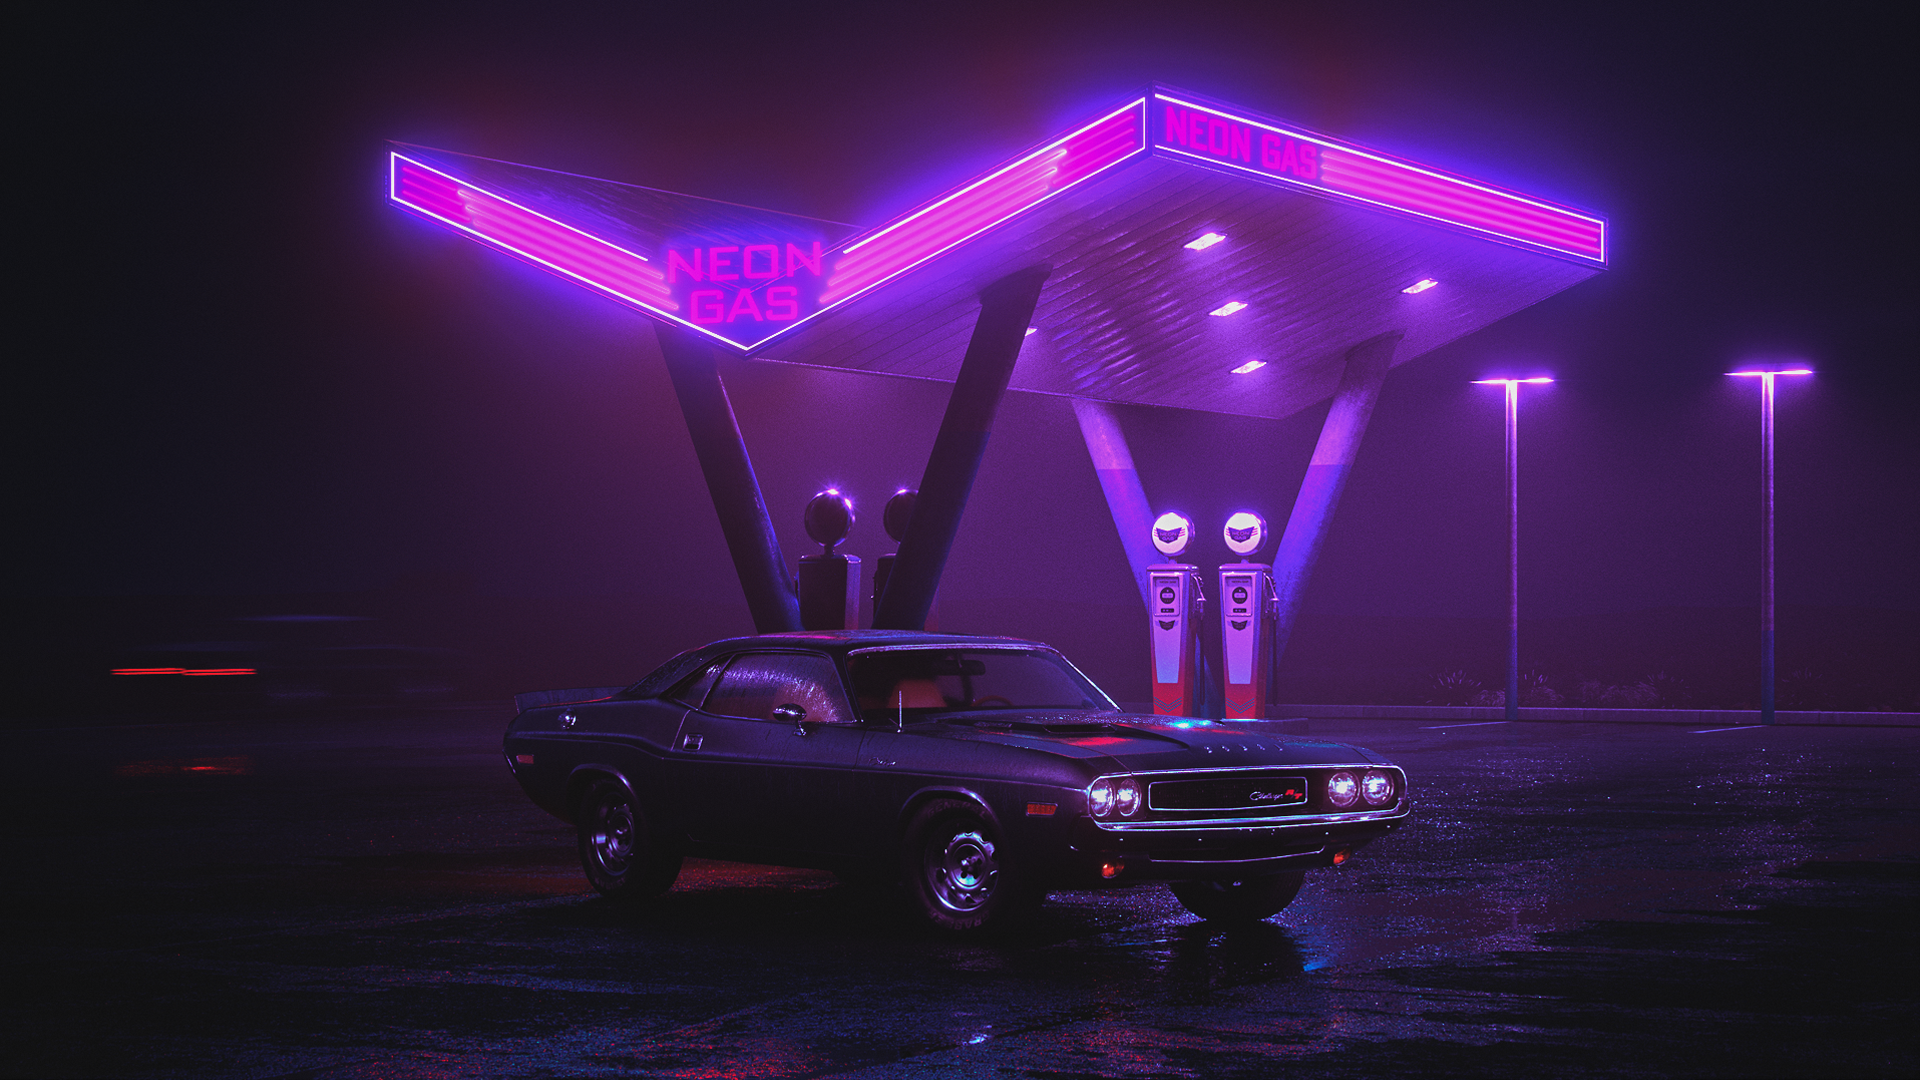 Neon Purple Car Wallpapers Top Free Neon Purple Car Backgrounds Wallpaperaccess